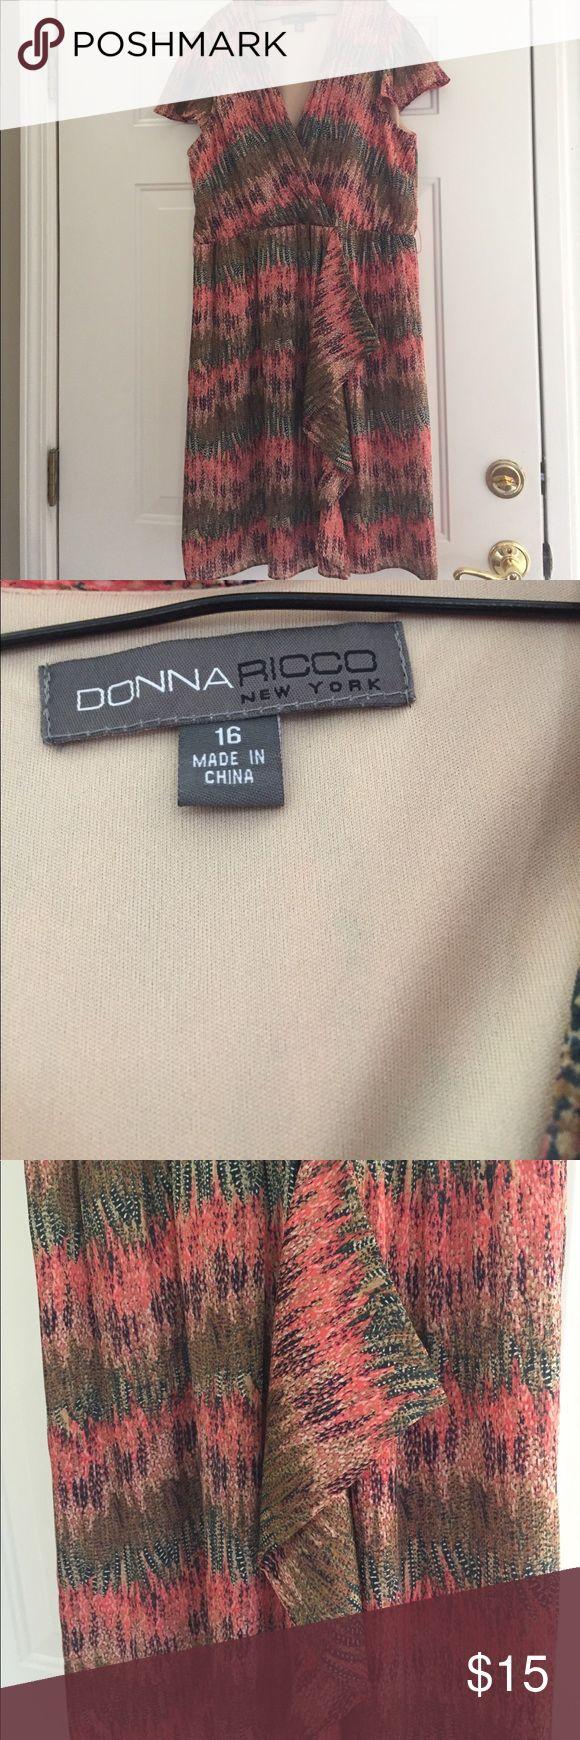 Donna Ricco Evening Wear